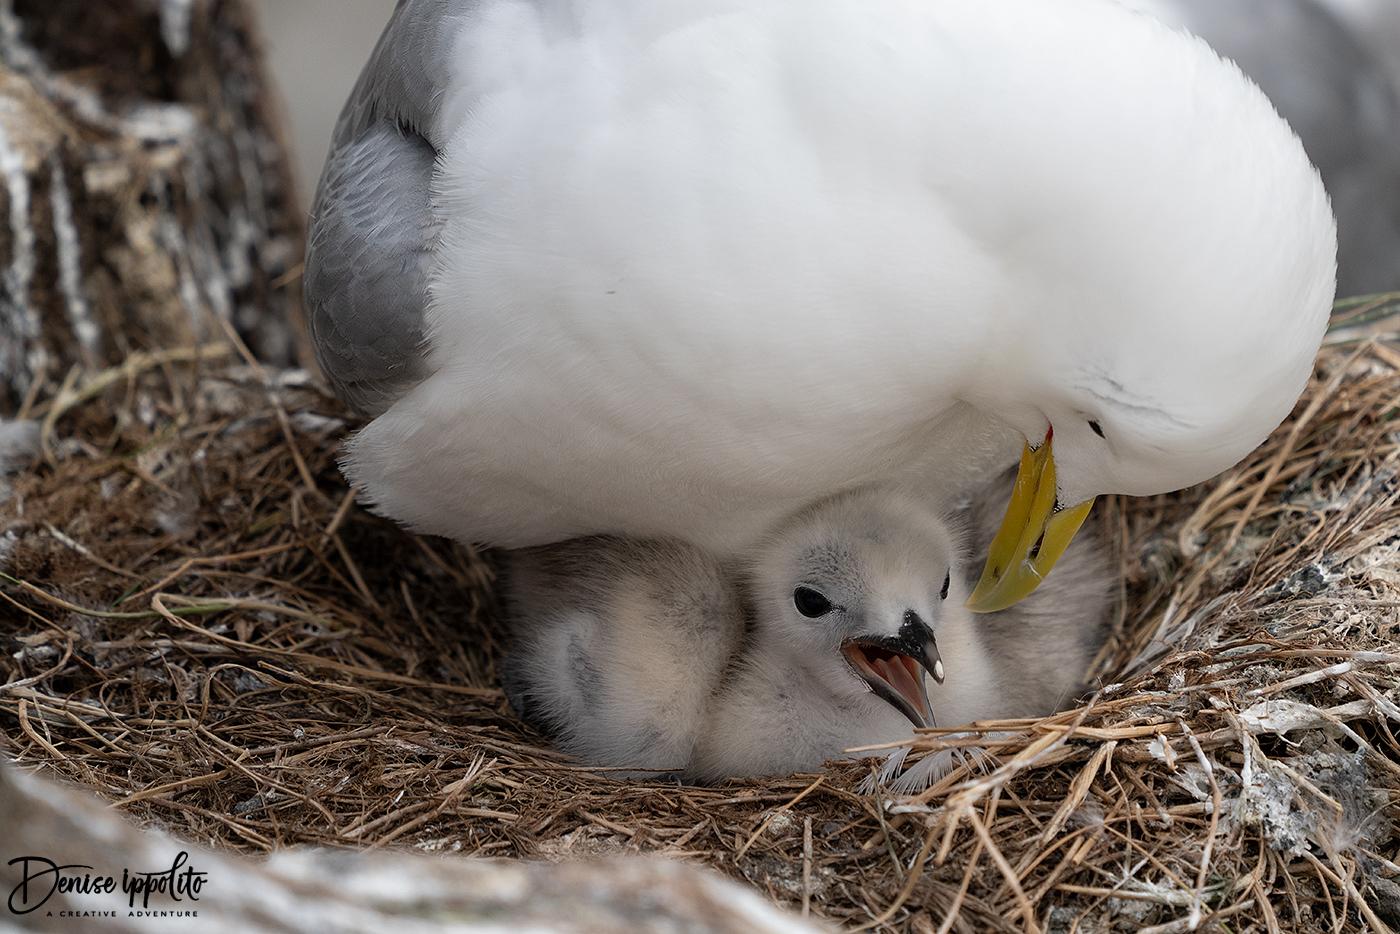 Kittiwake with chick